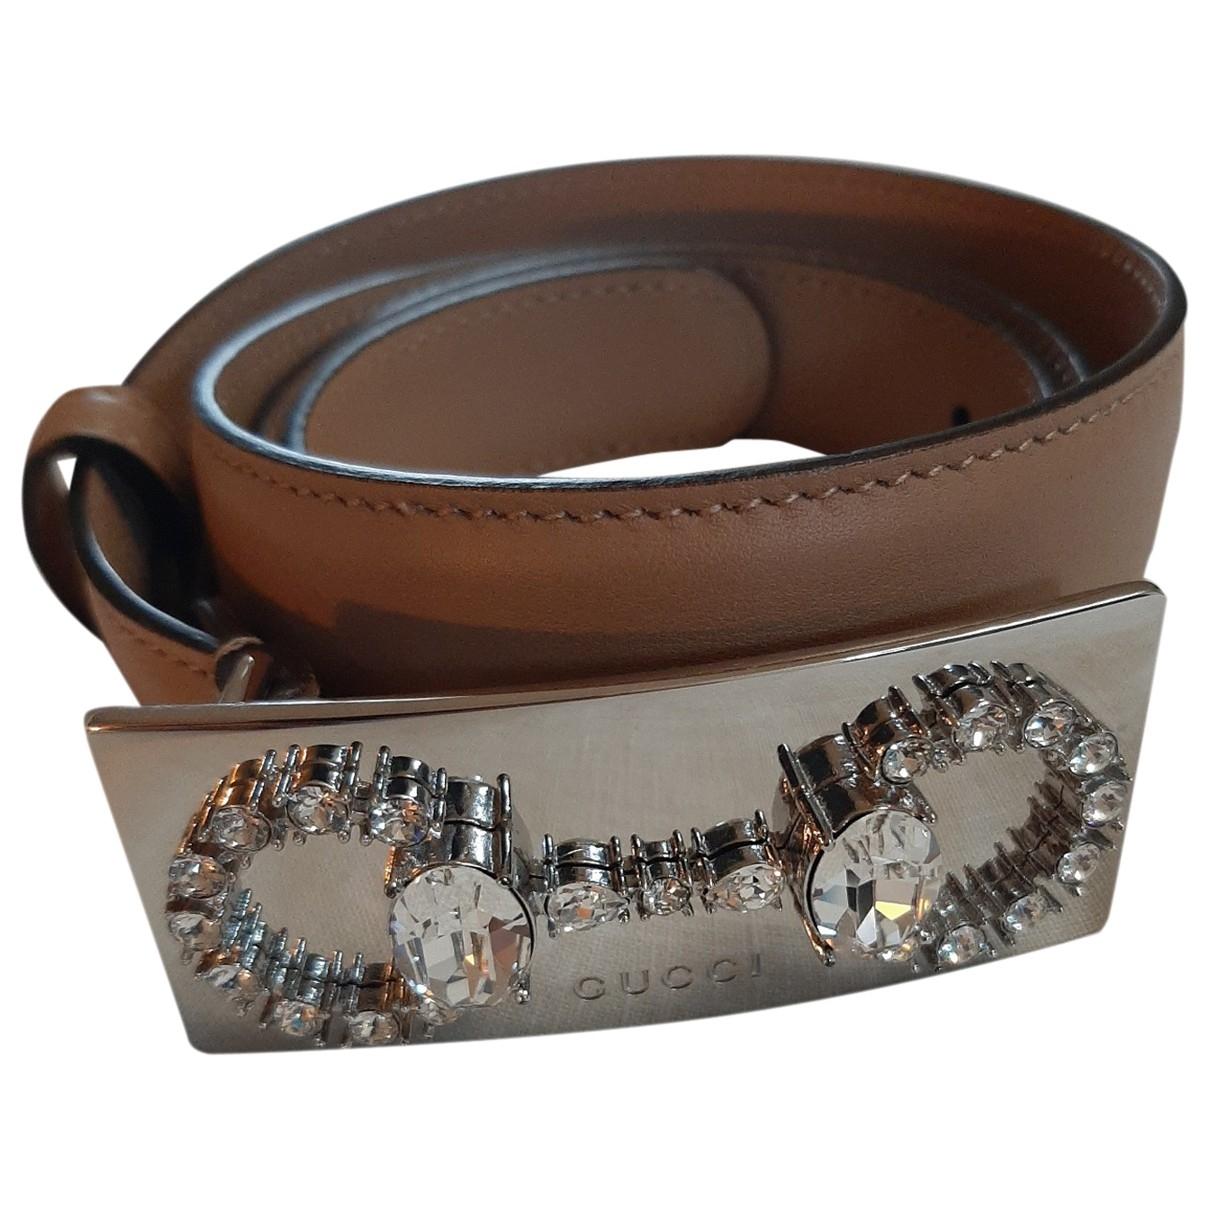 Gucci \N Beige Leather belt for Women S International